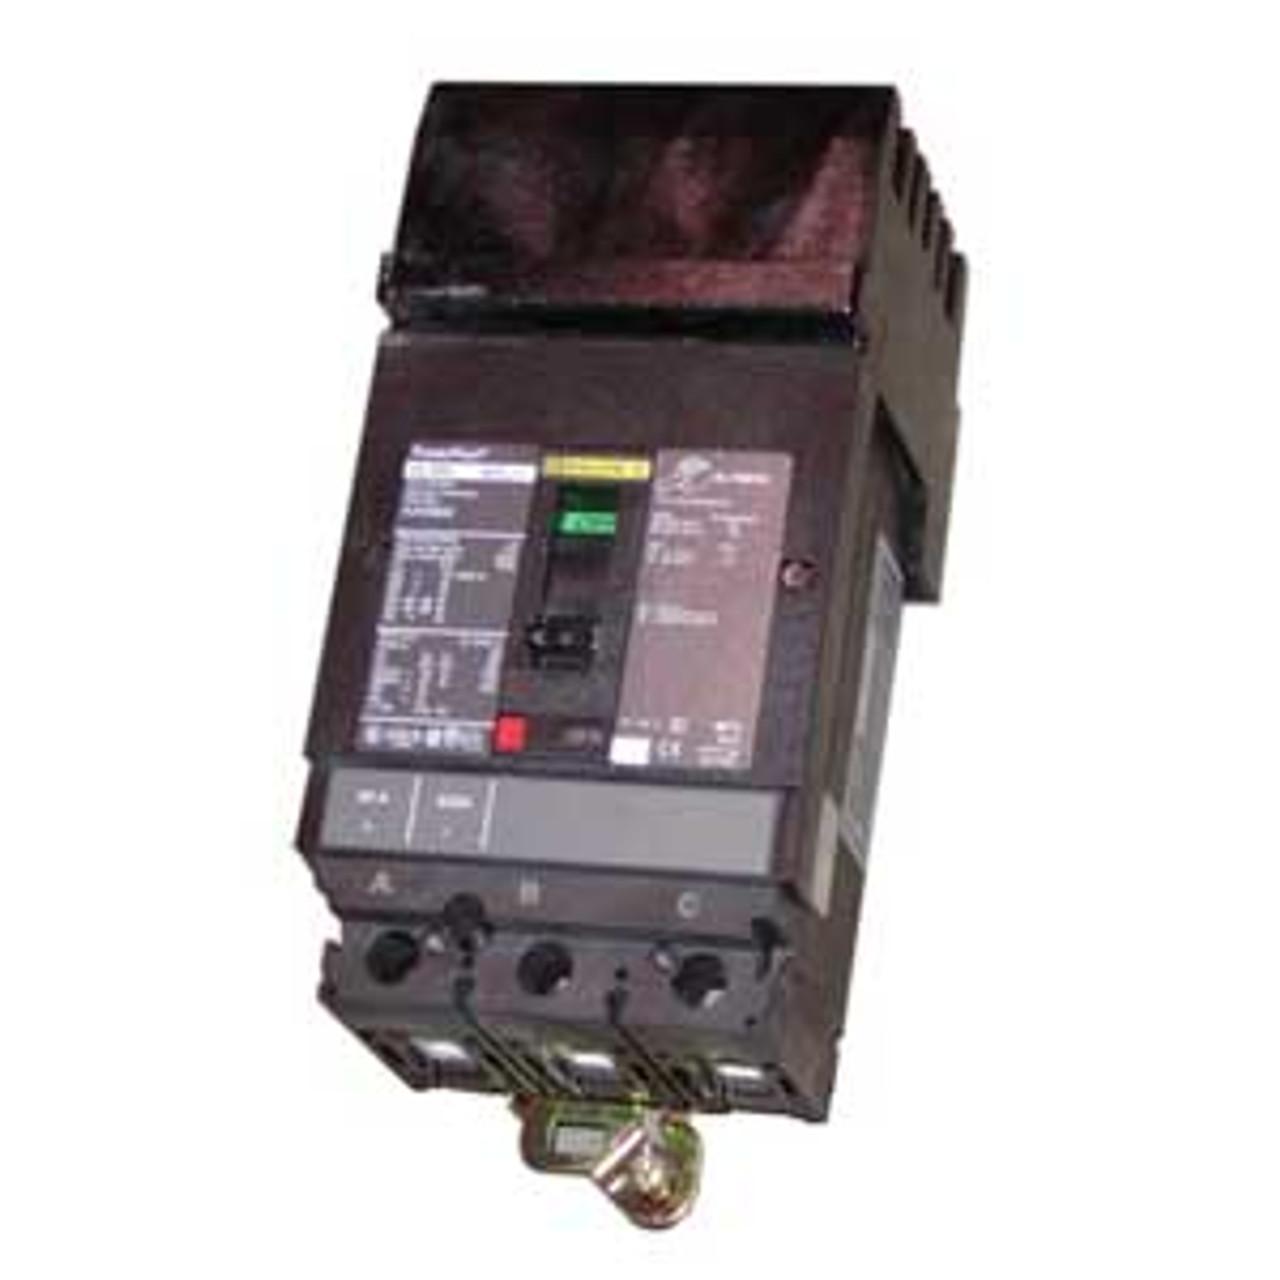 Square D HGA36090 3 Pole 90 Amp 600VAC MC Circuit Breaker - Used